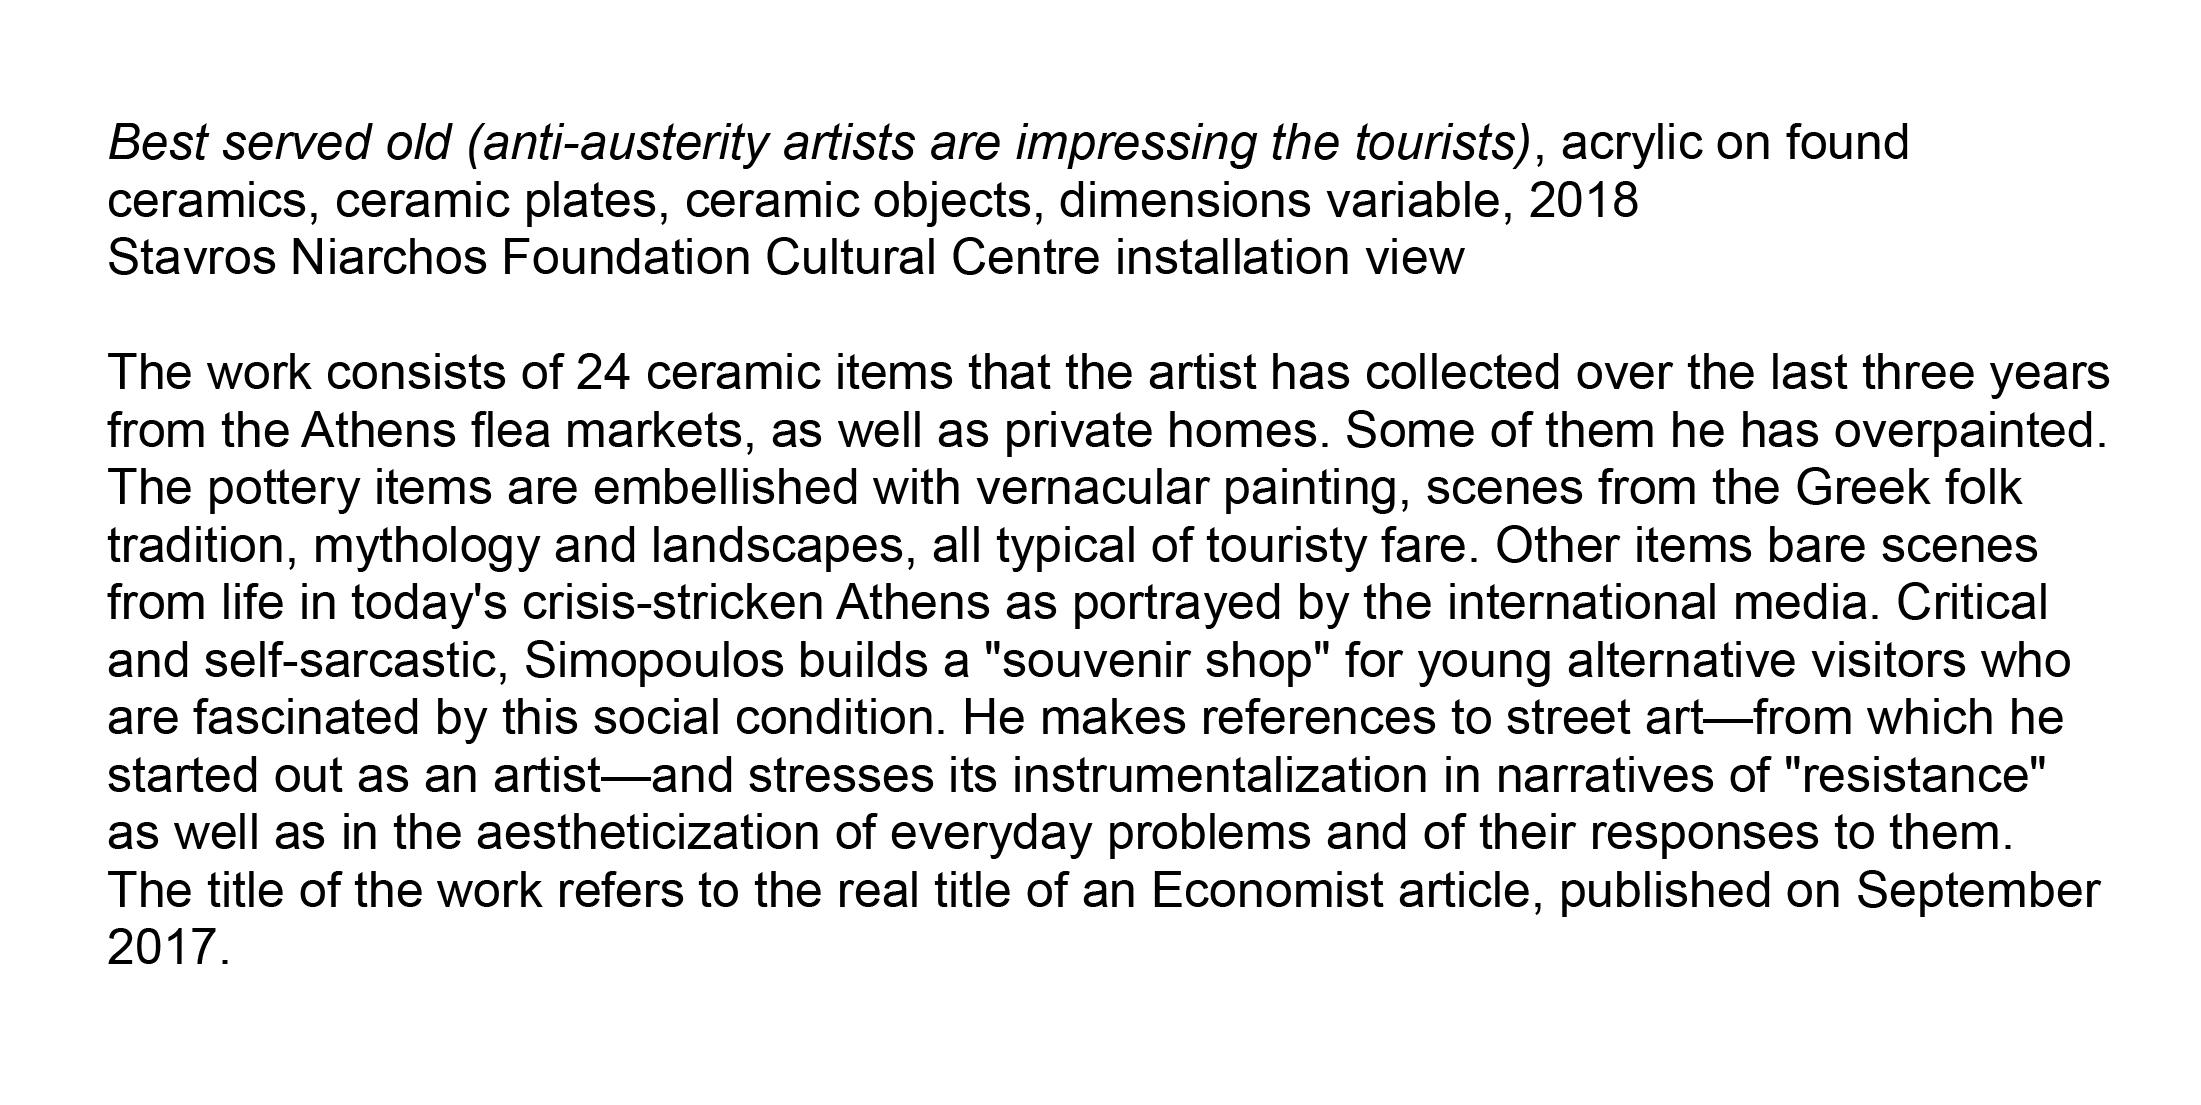 antiausterity artists text.jpg